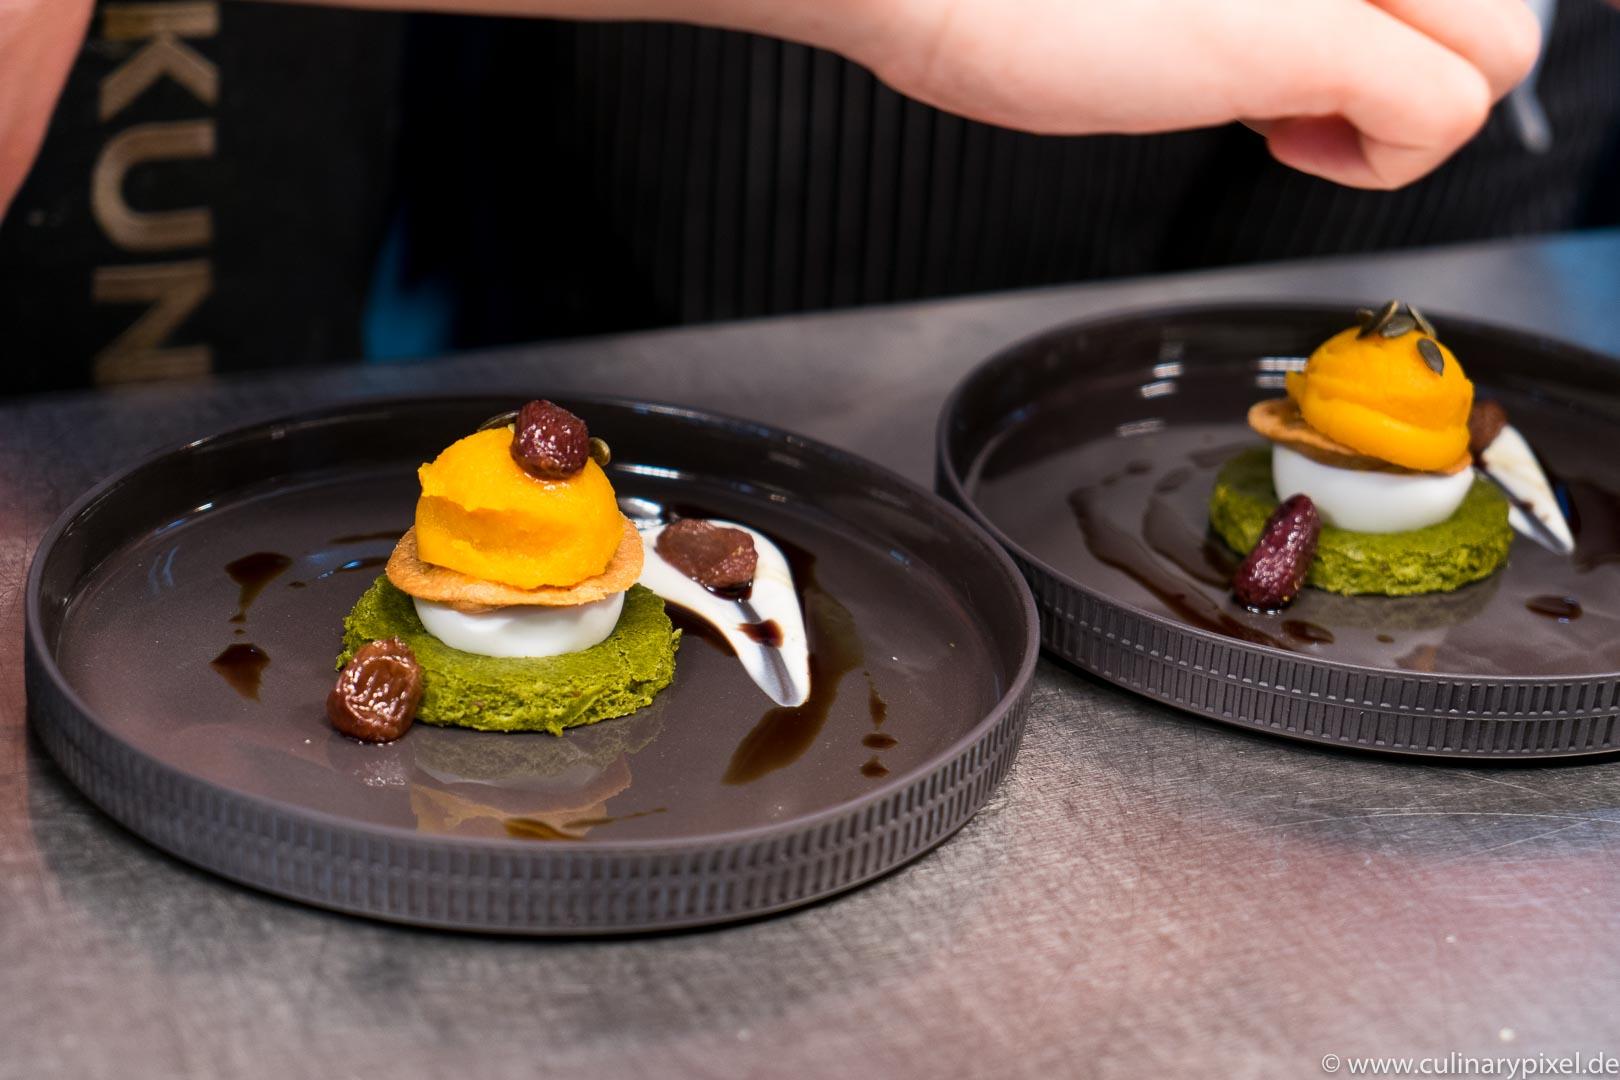 dsc02543 culinary pixel food blog rezepte wein restaurants genuss. Black Bedroom Furniture Sets. Home Design Ideas